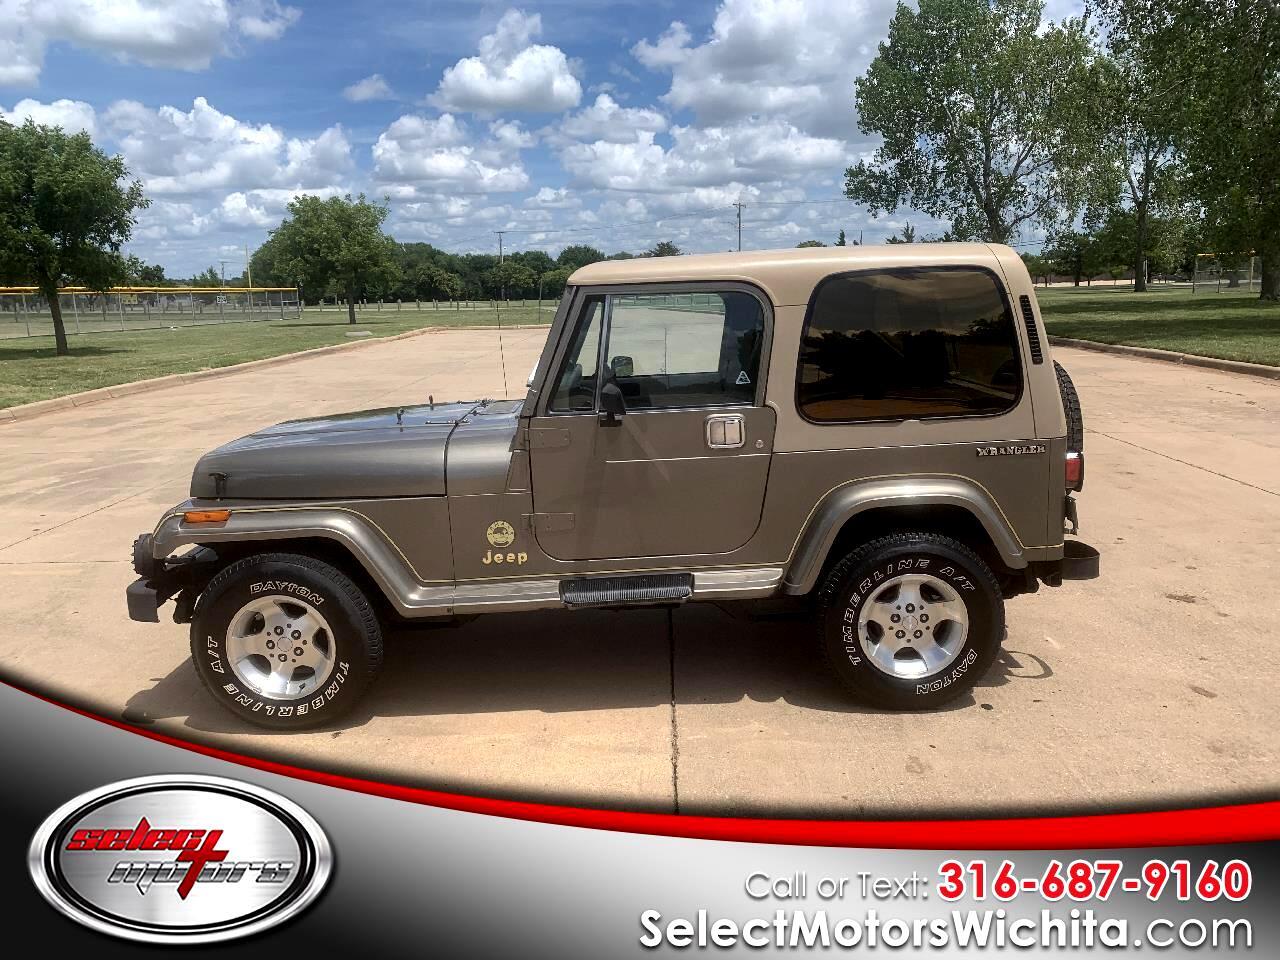 Jeep Wrangler 2dr Sahara 1990